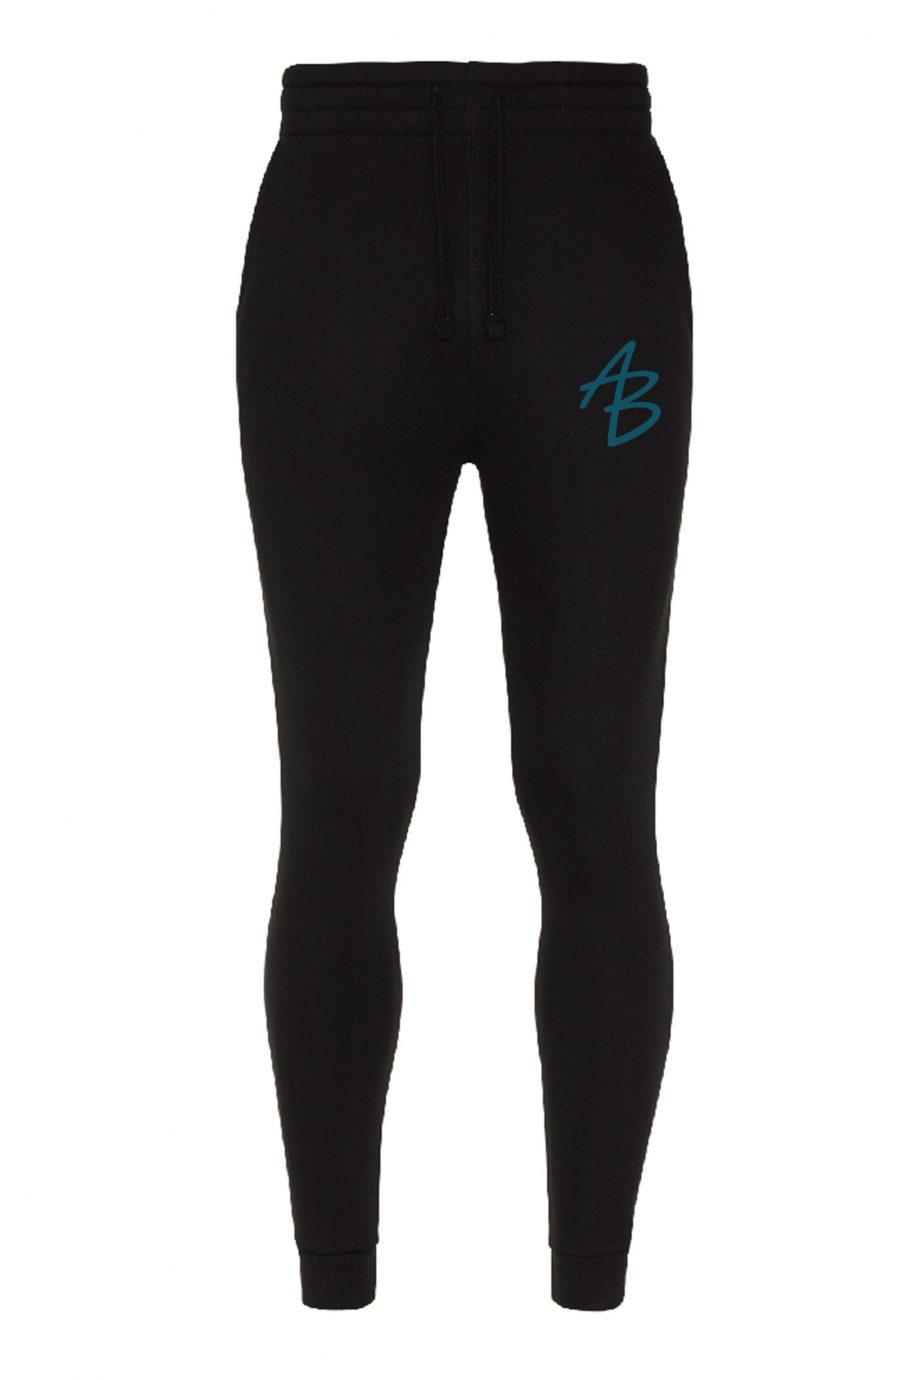 AB1-Track-pants-scaled-1.jpg